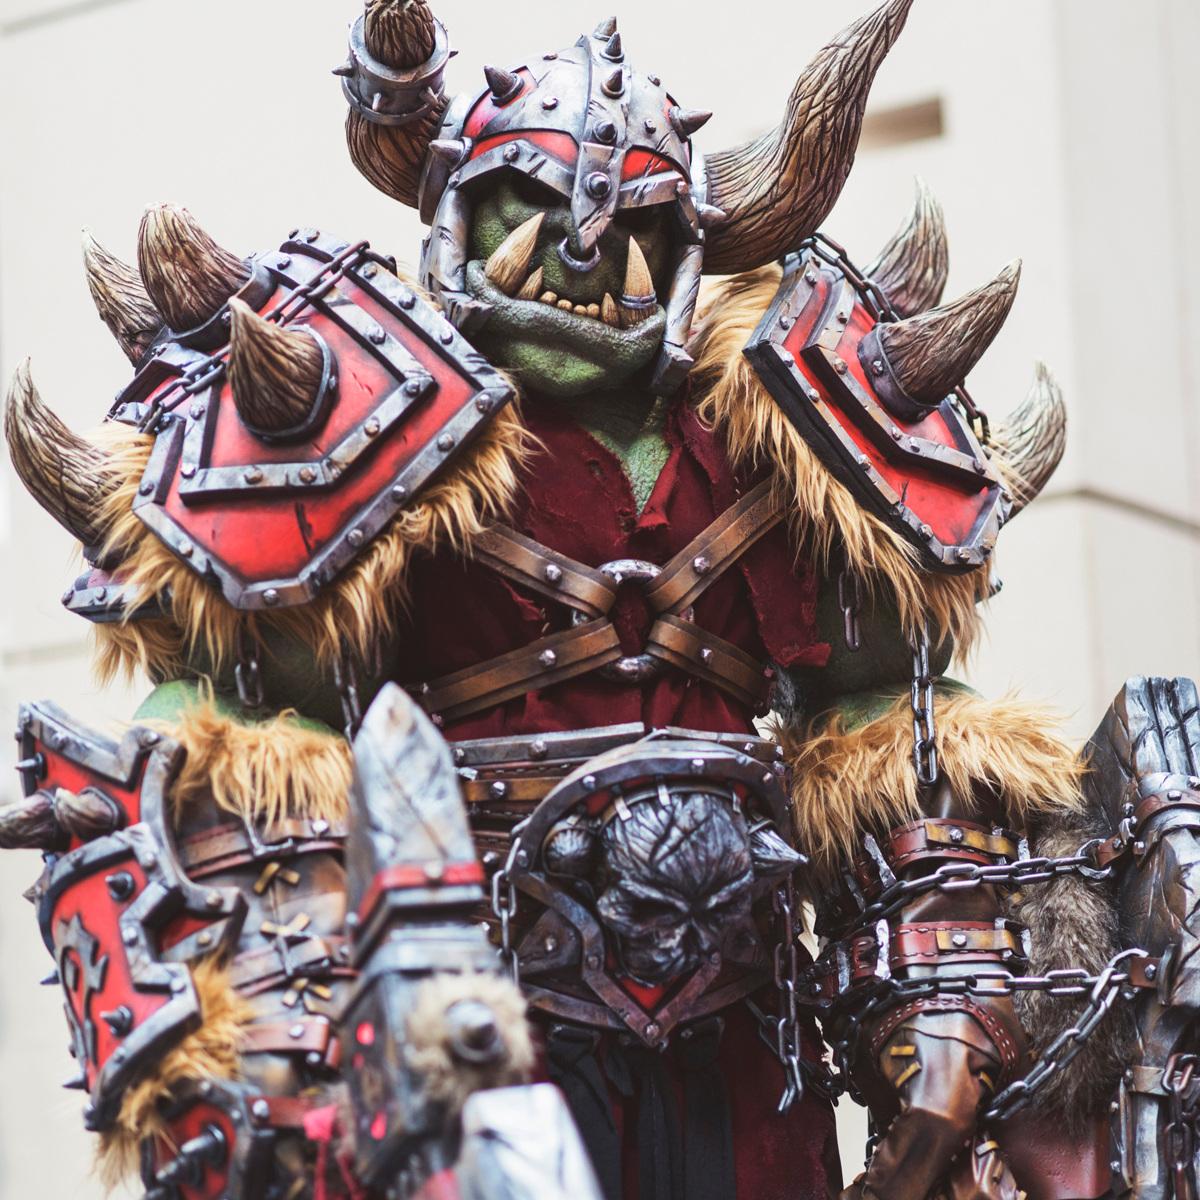 Warcraft 3 Orc -